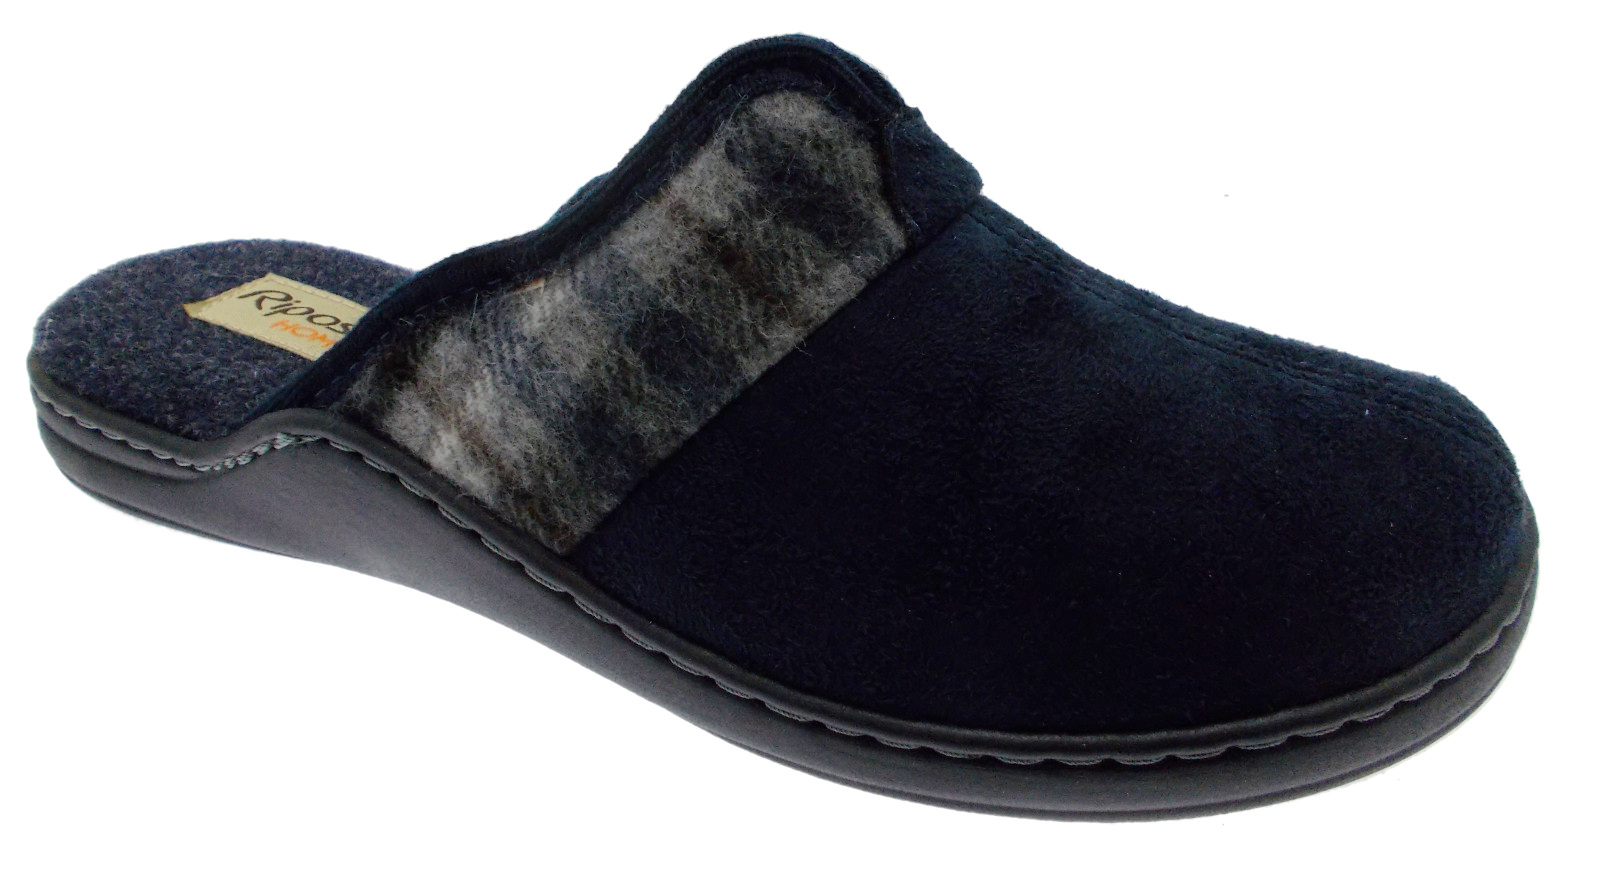 9904 slipper schoen inlegzool blauwe man geheugen Riposella